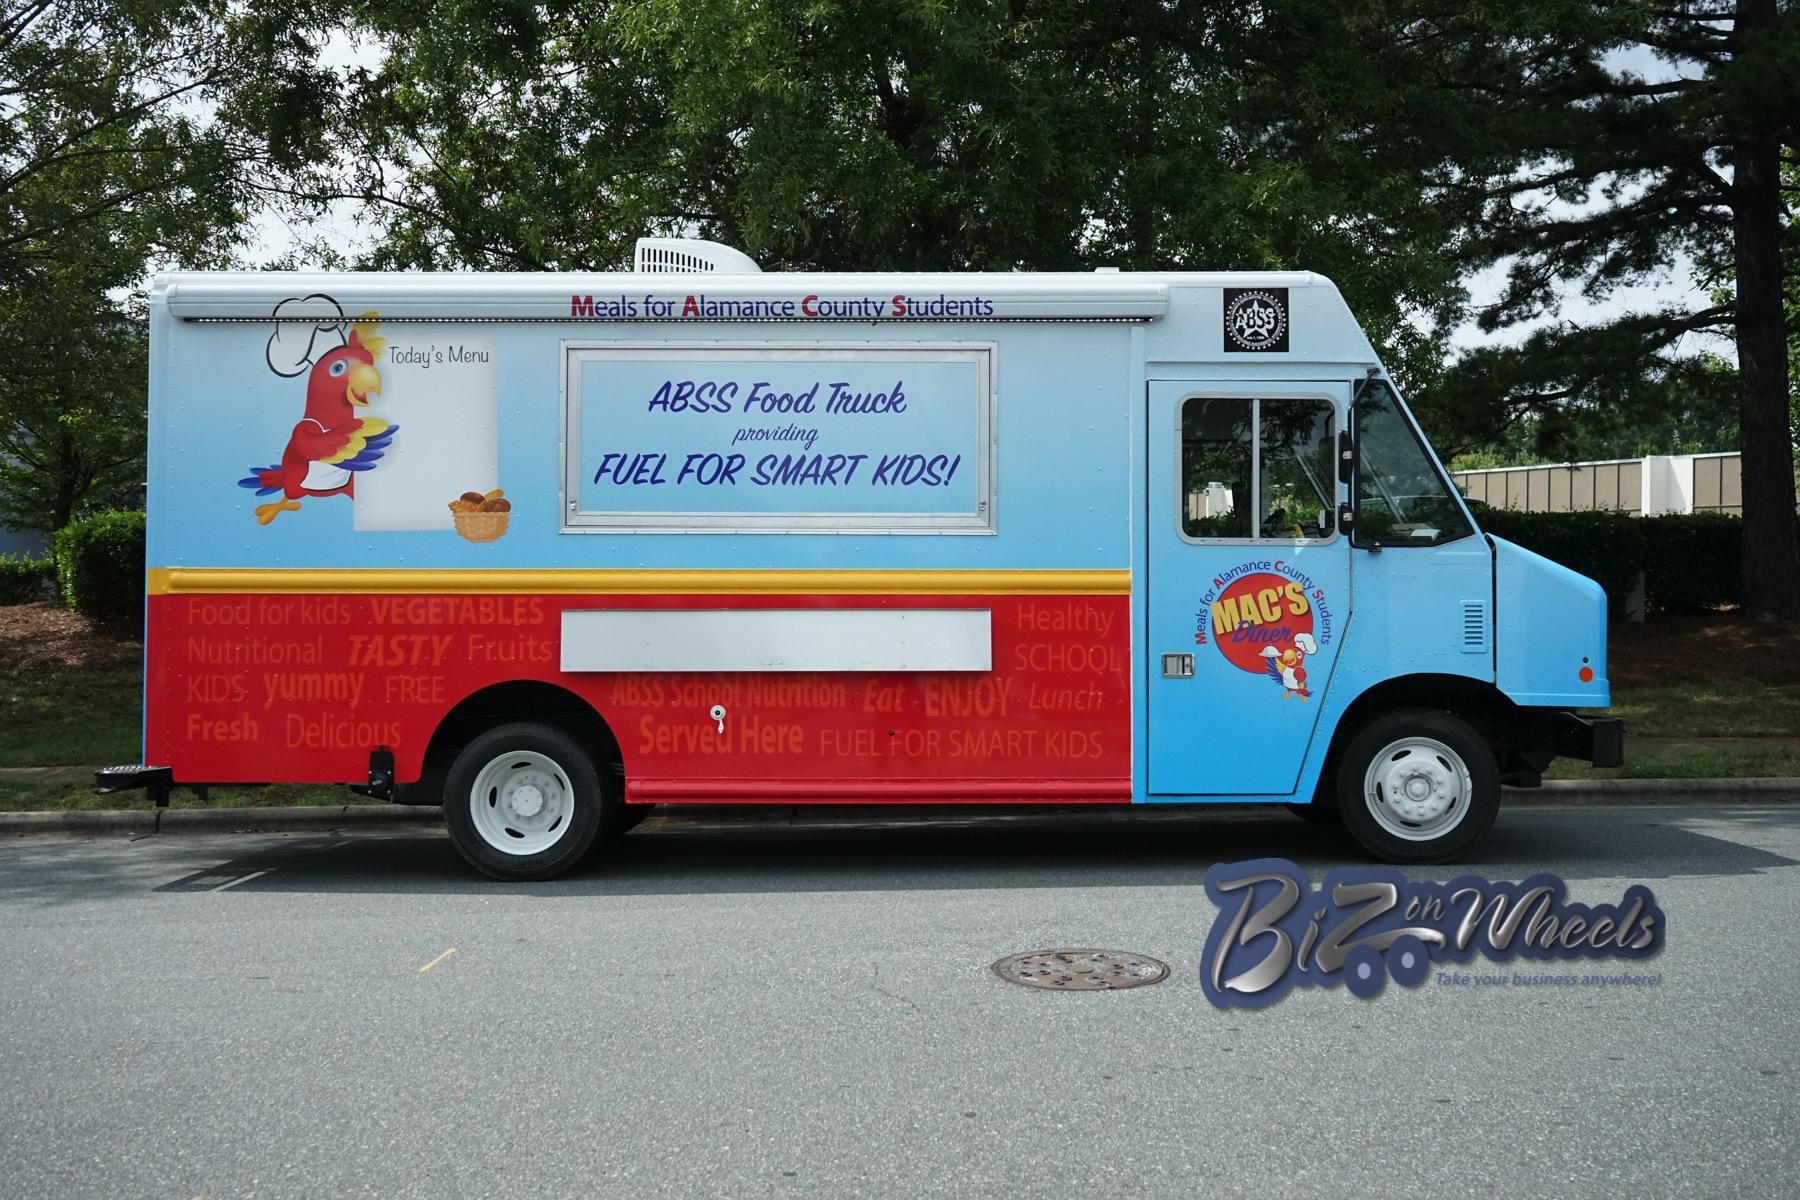 Alamance-Burlington School System Food truck